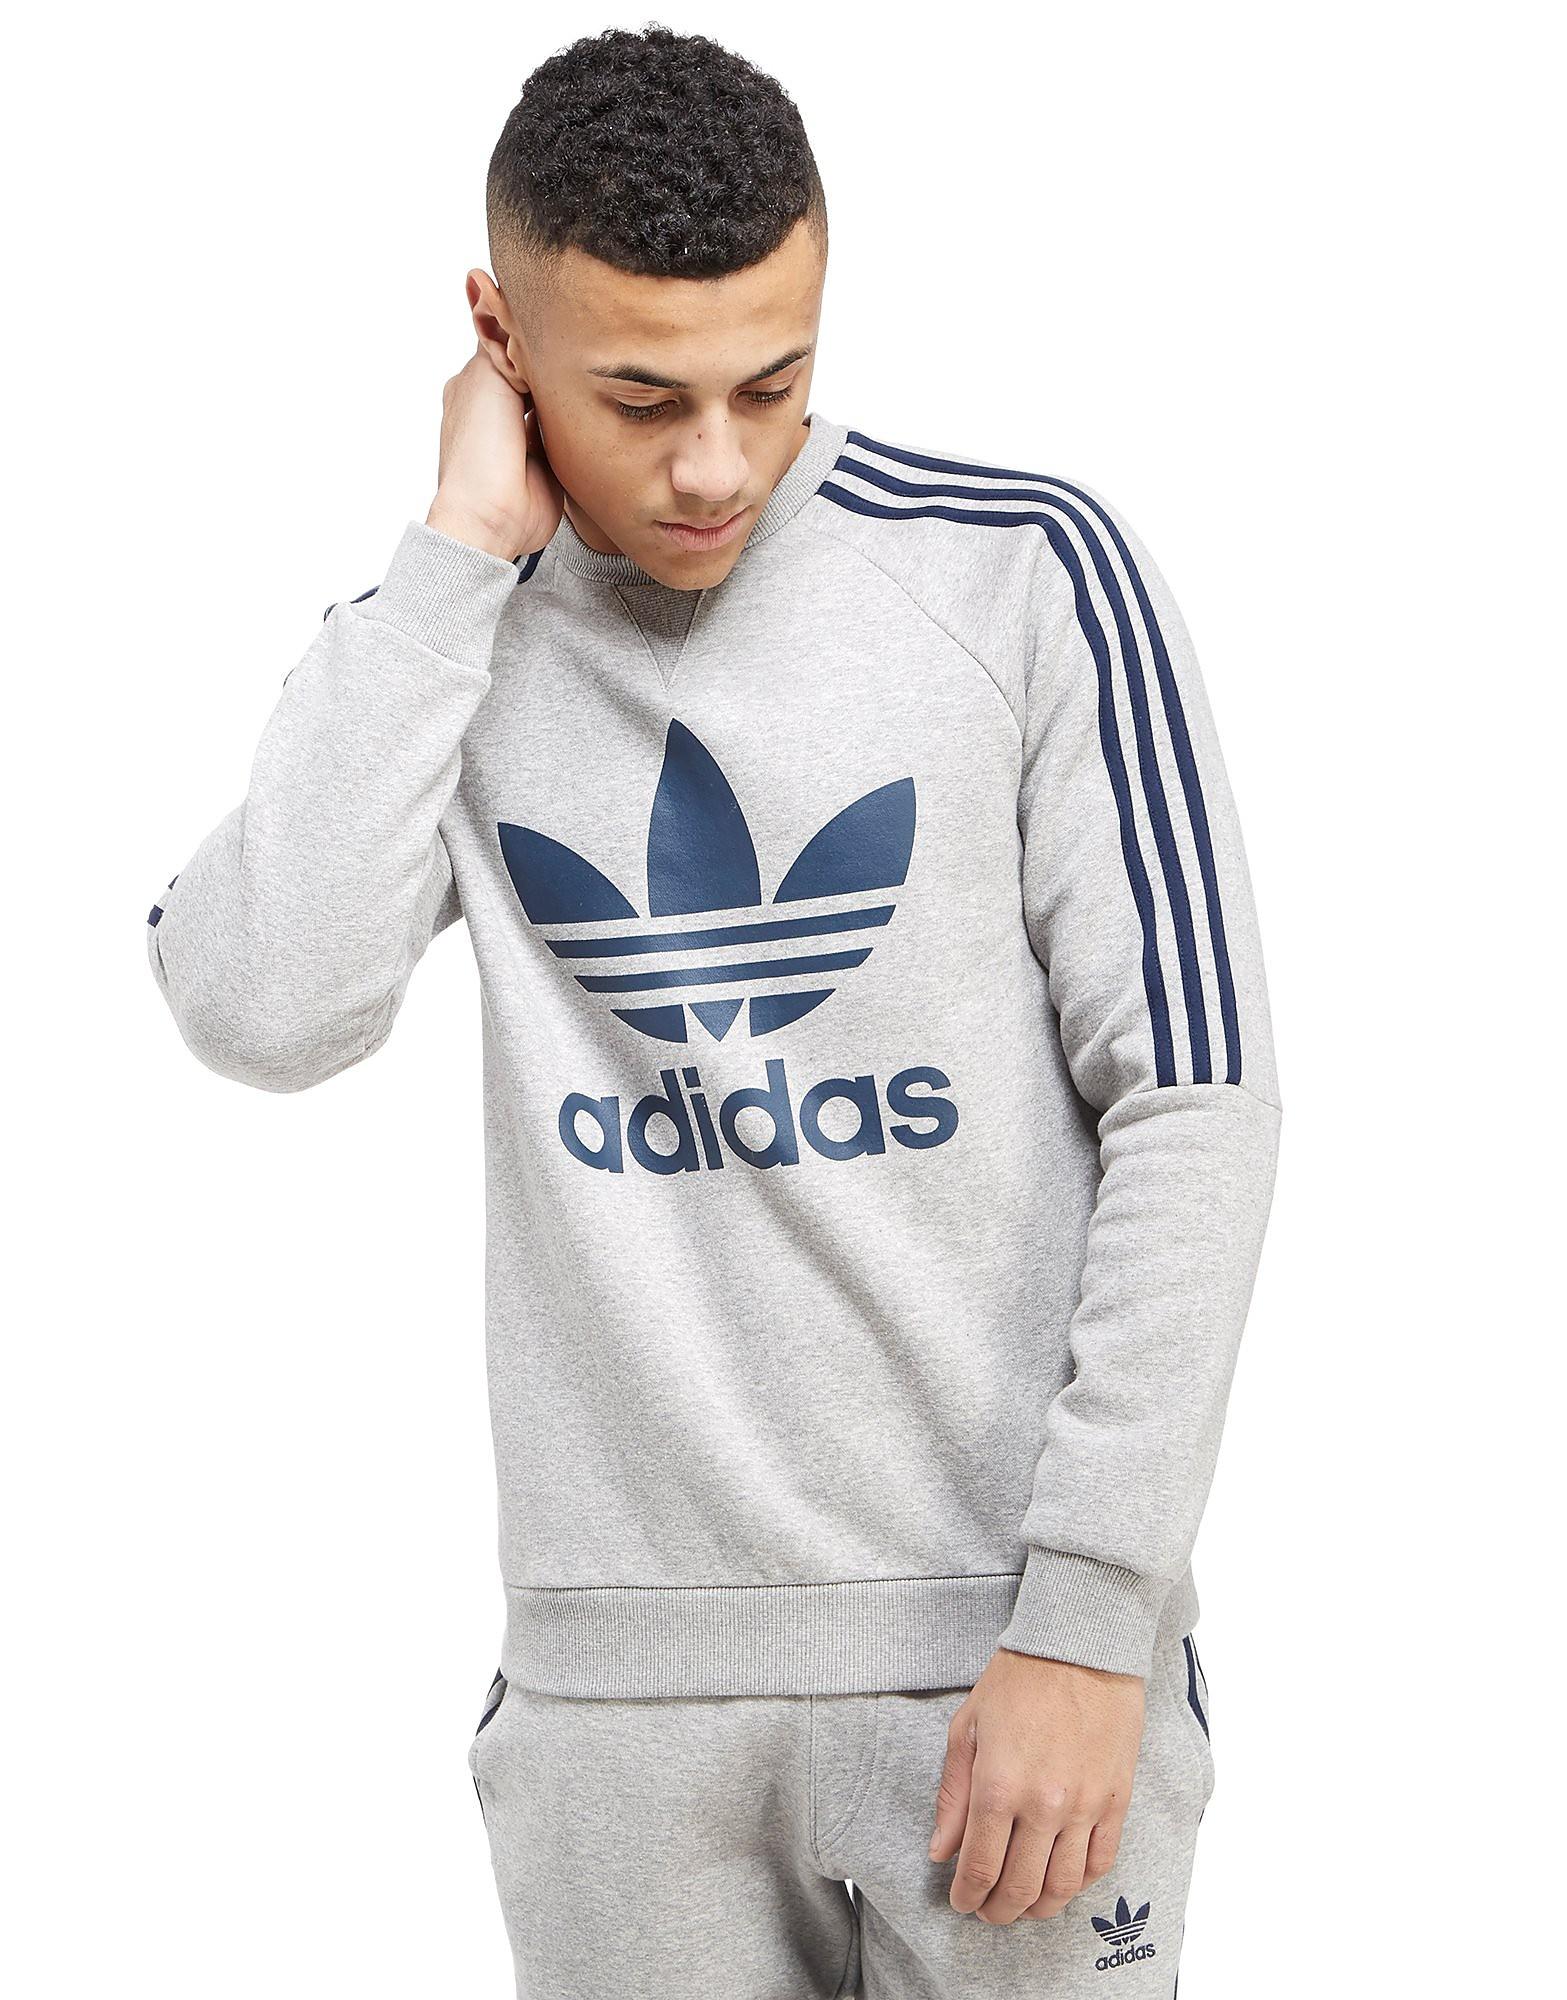 adidas Originals 3 Stripe Trefoil Sweatshirt